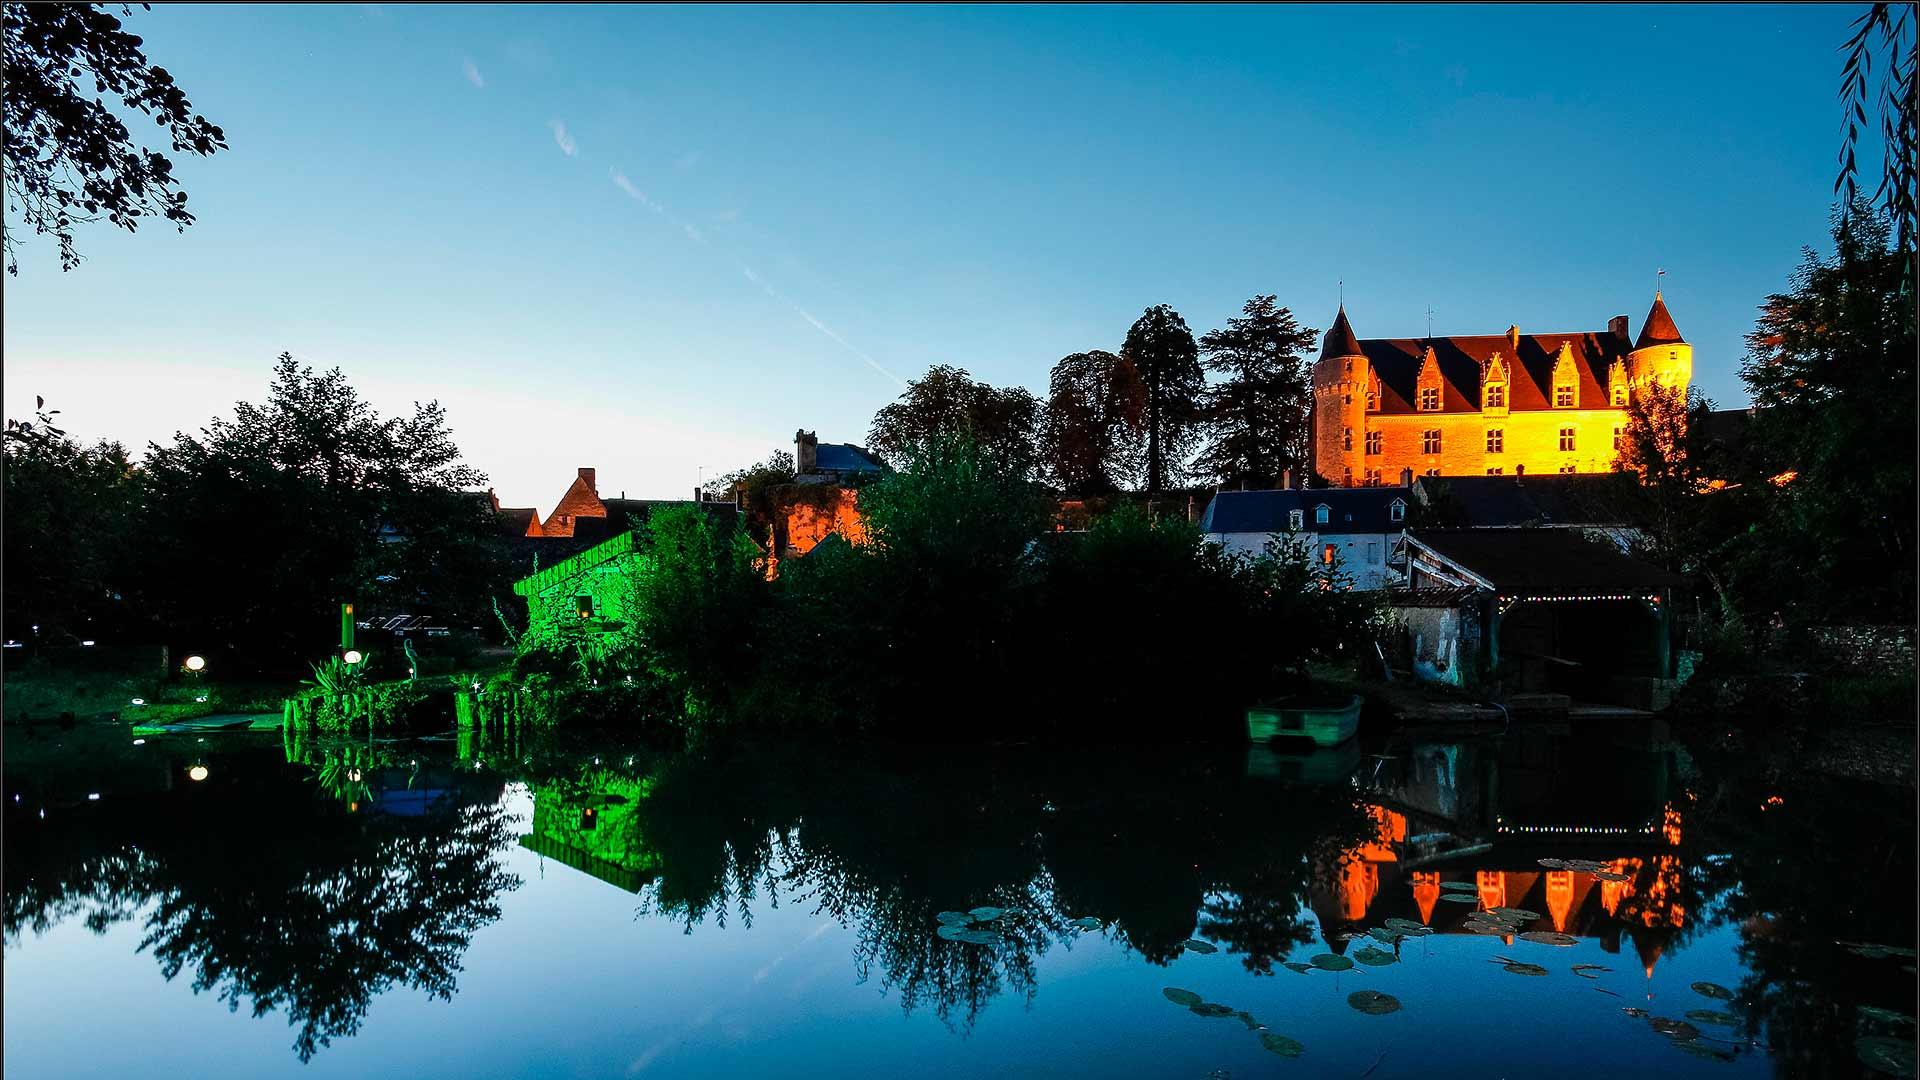 Solar nights - Montrésor, France.